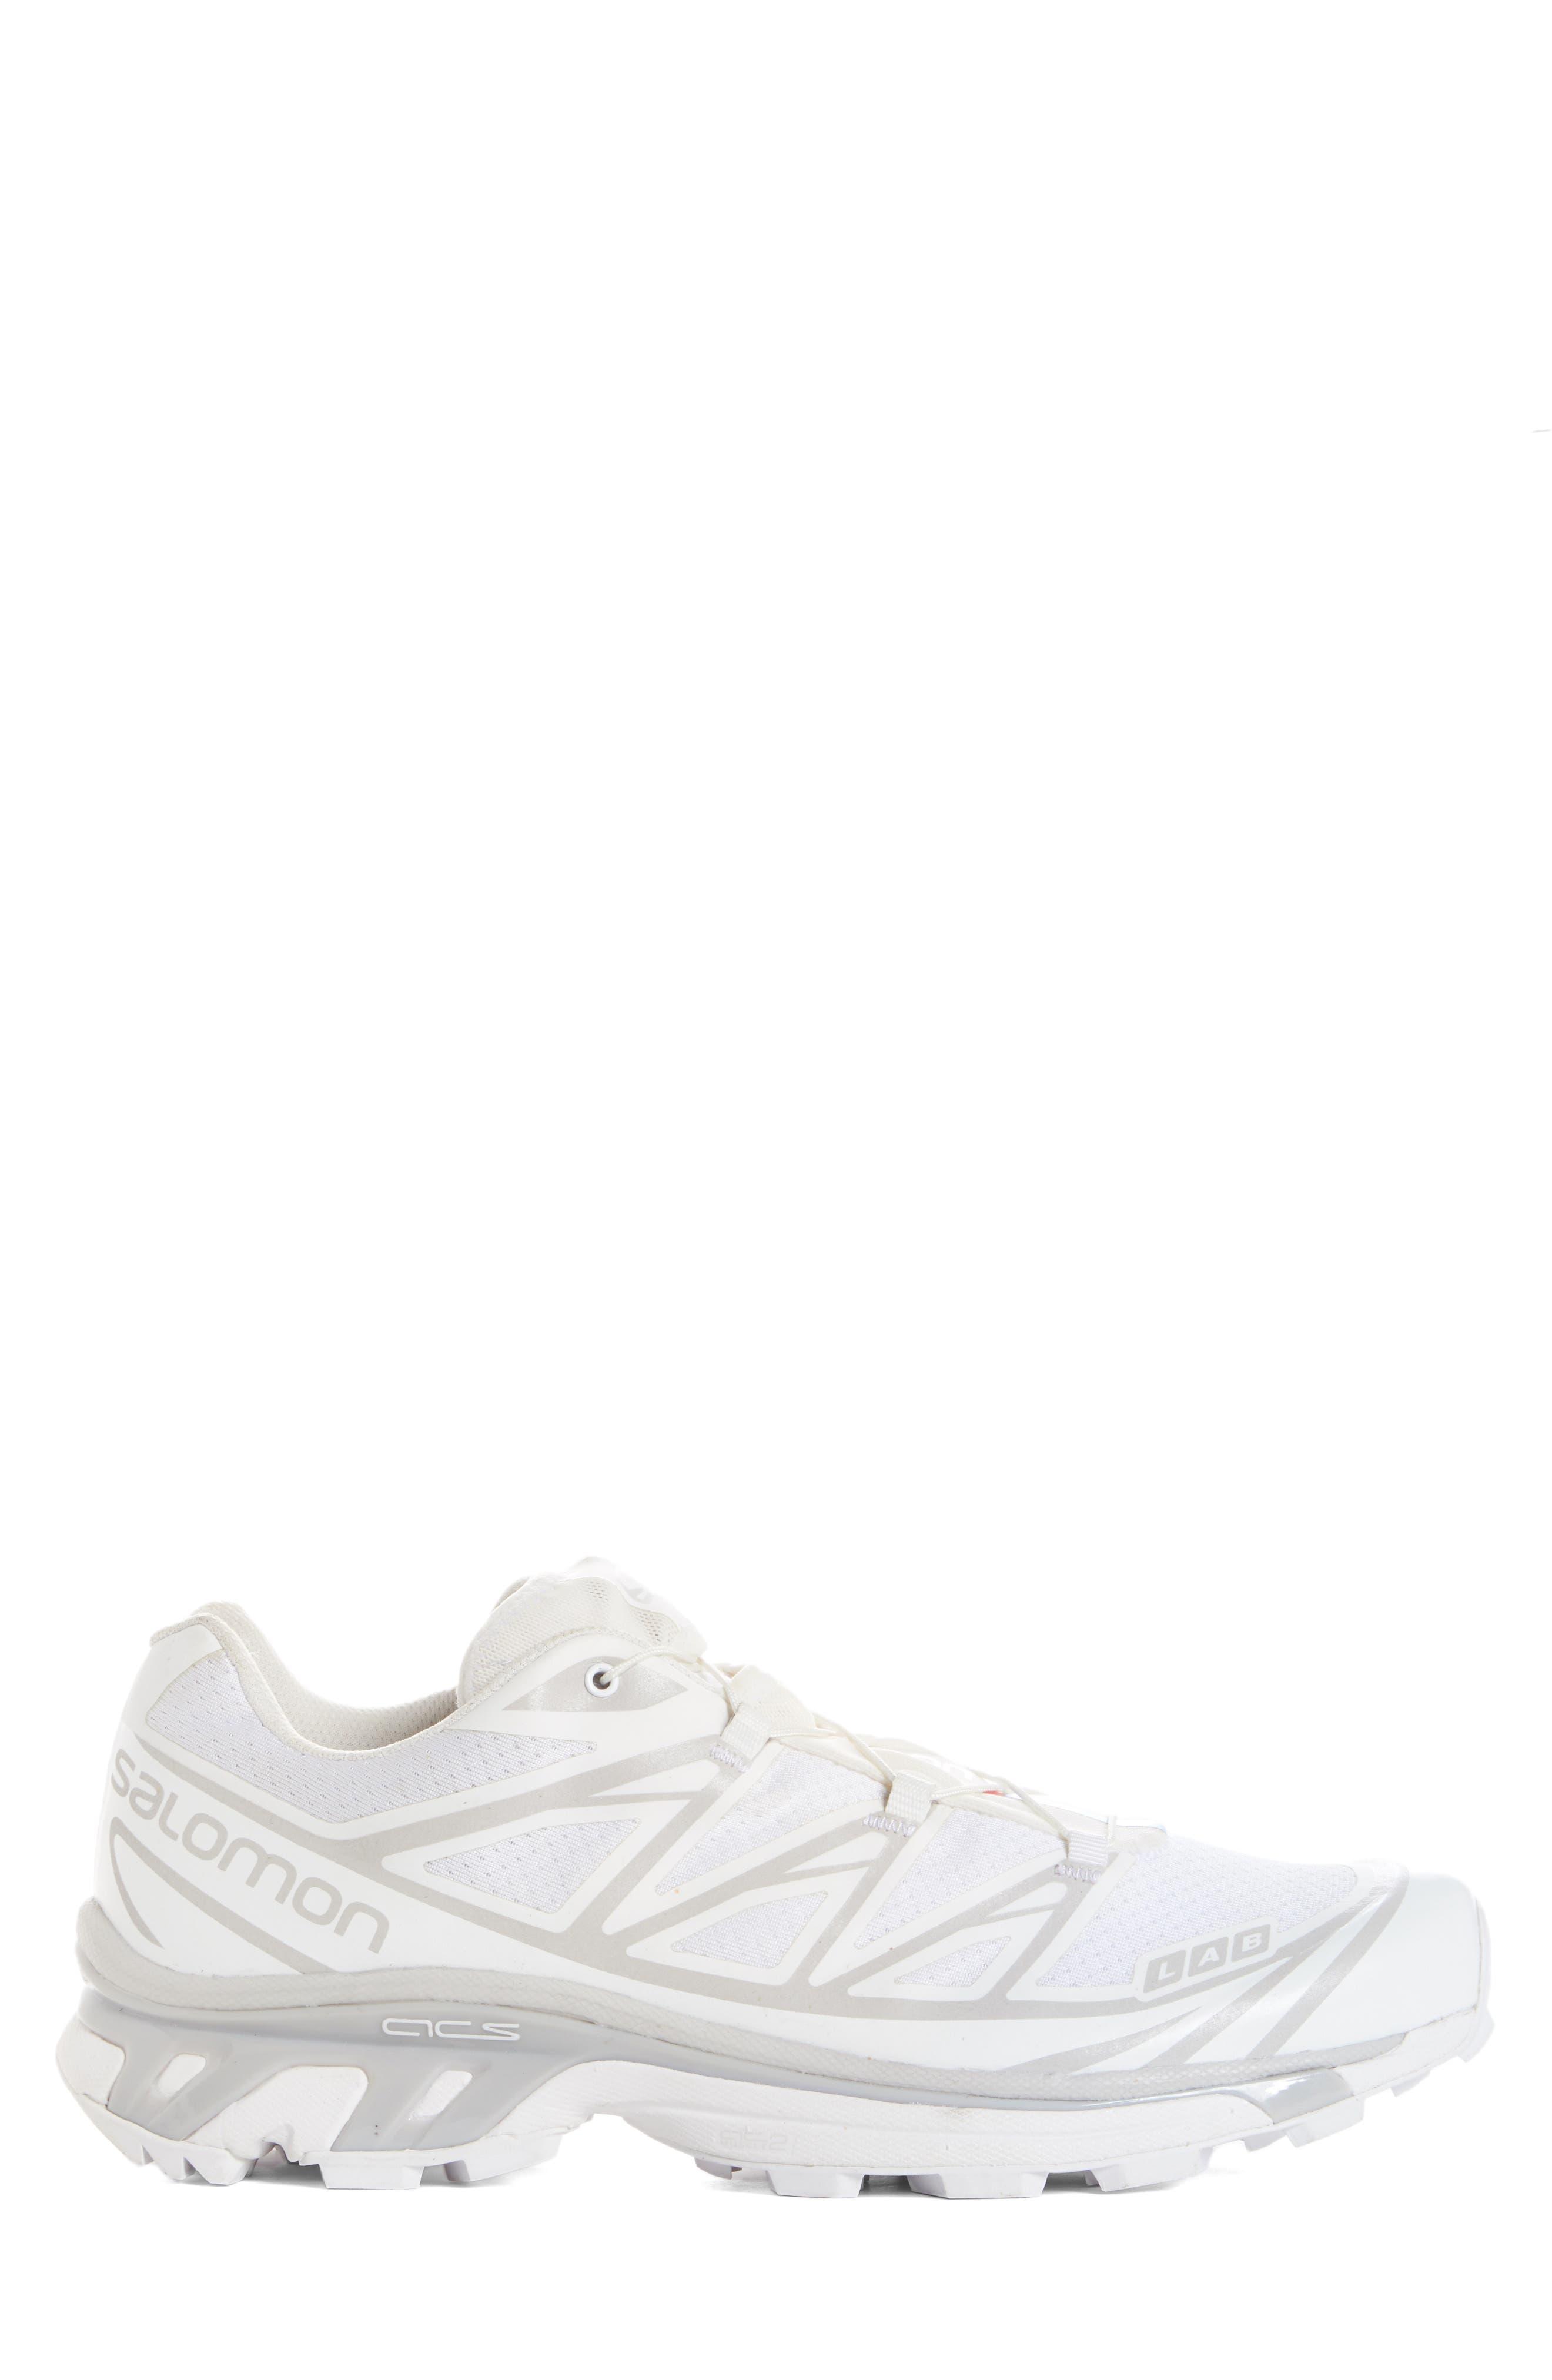 S/Lab Xt 6 Softground Adv Ltd Sneaker by Salomon